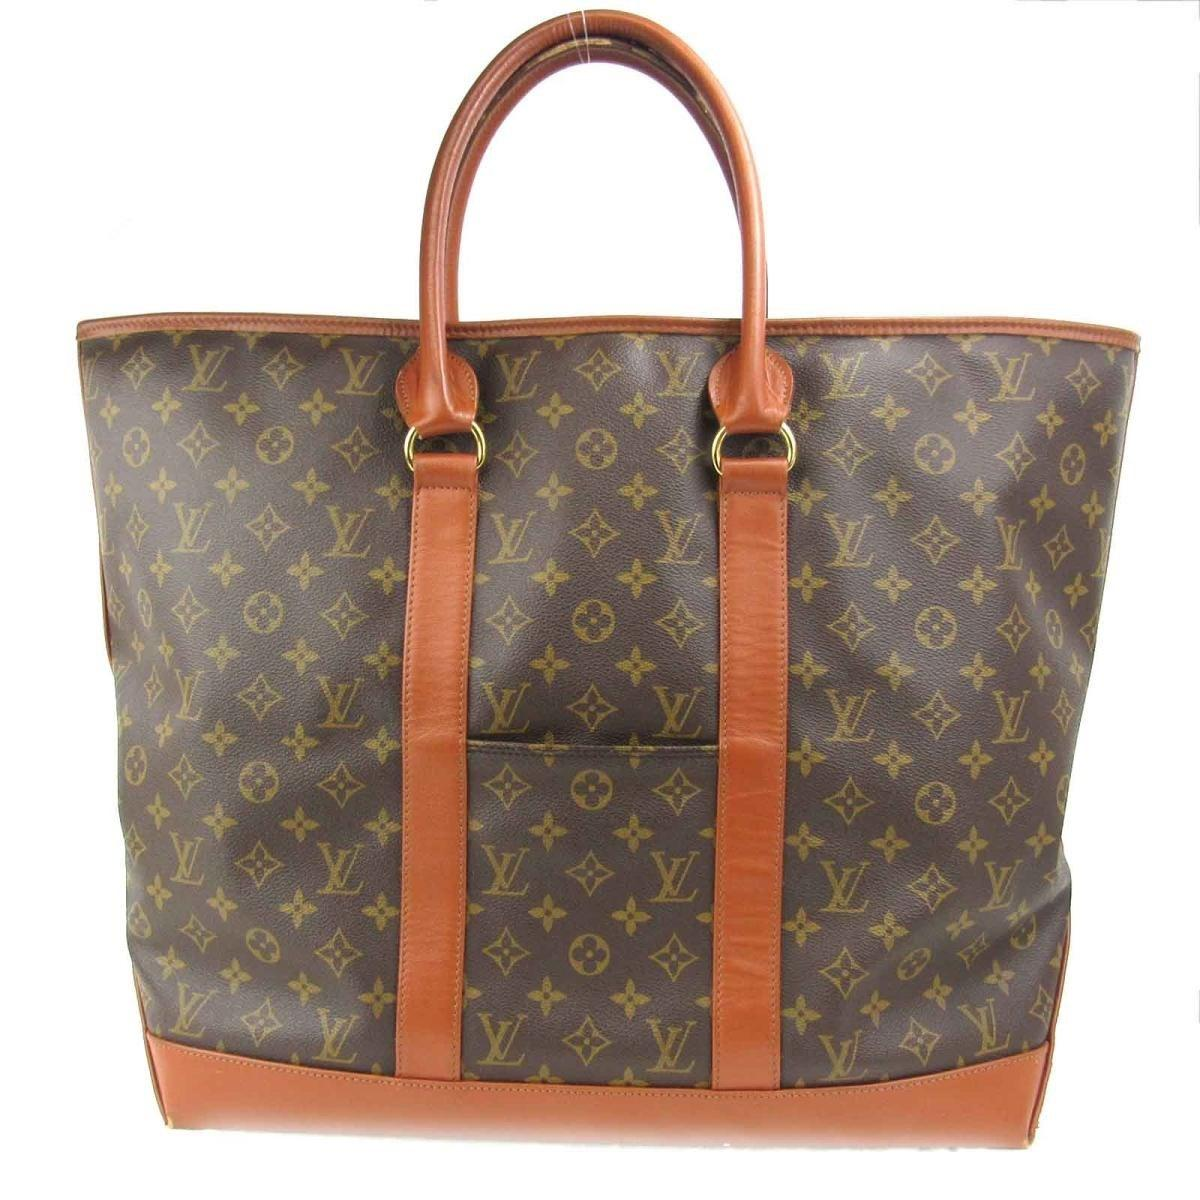 957dd805b Louis Vuitton. Men's Brown Authentic Weekend Gm Tote Bag Monogram Canvas  Used Vintage M42420